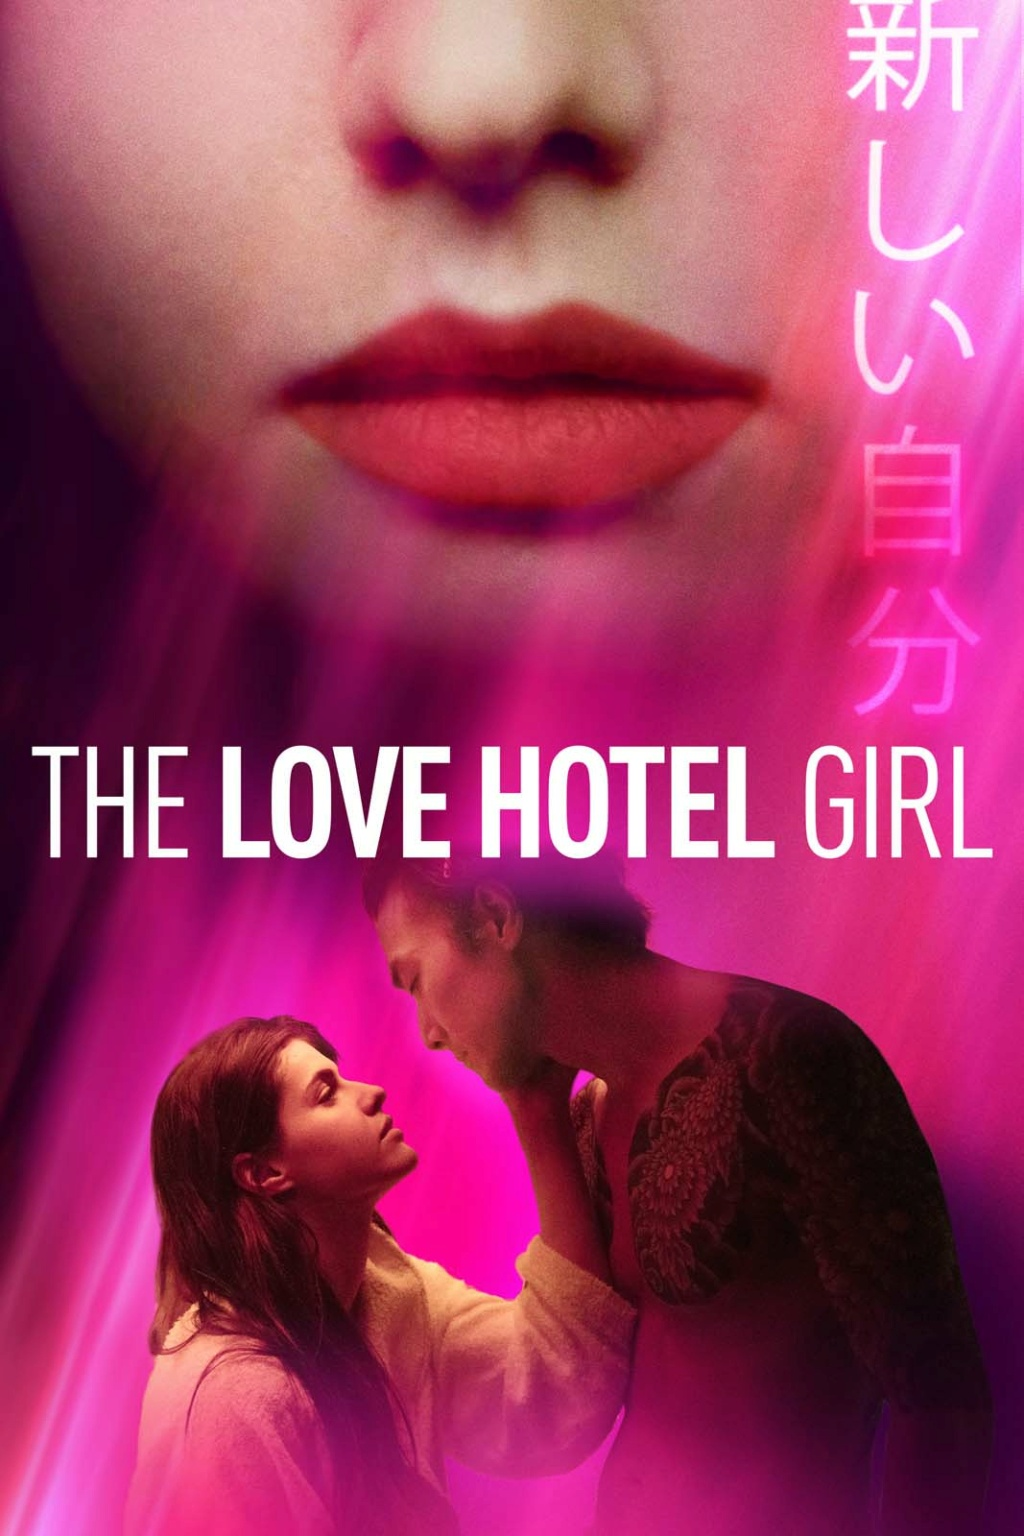 Love Hotel Girl Lhgcou10